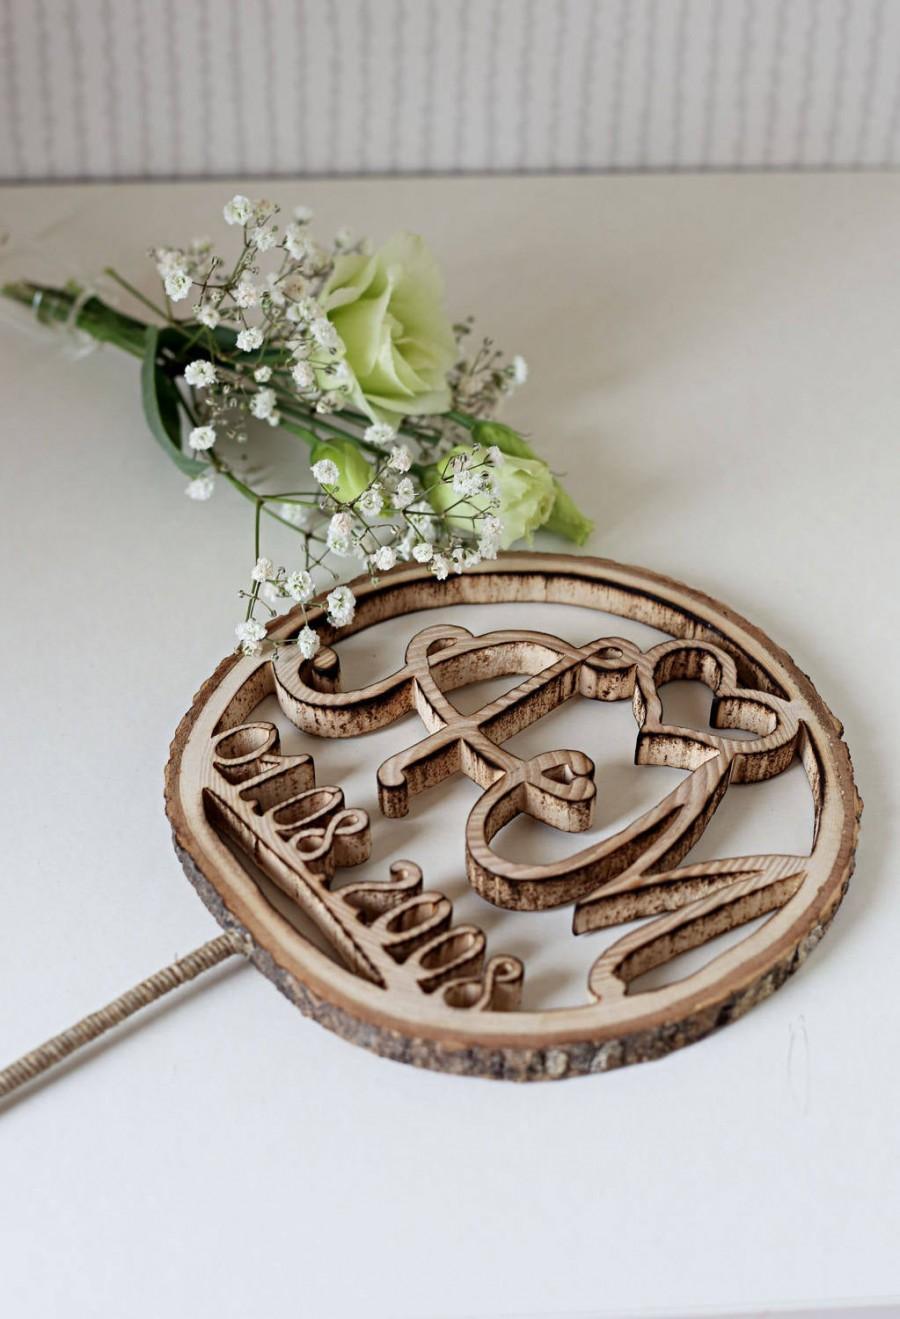 Свадьба - Wedding cake topper, Rustic cake decor,  Personalized Cake Topper,  Wood slice cake topper, Initials cake topper, Rustic cake topper, Boho